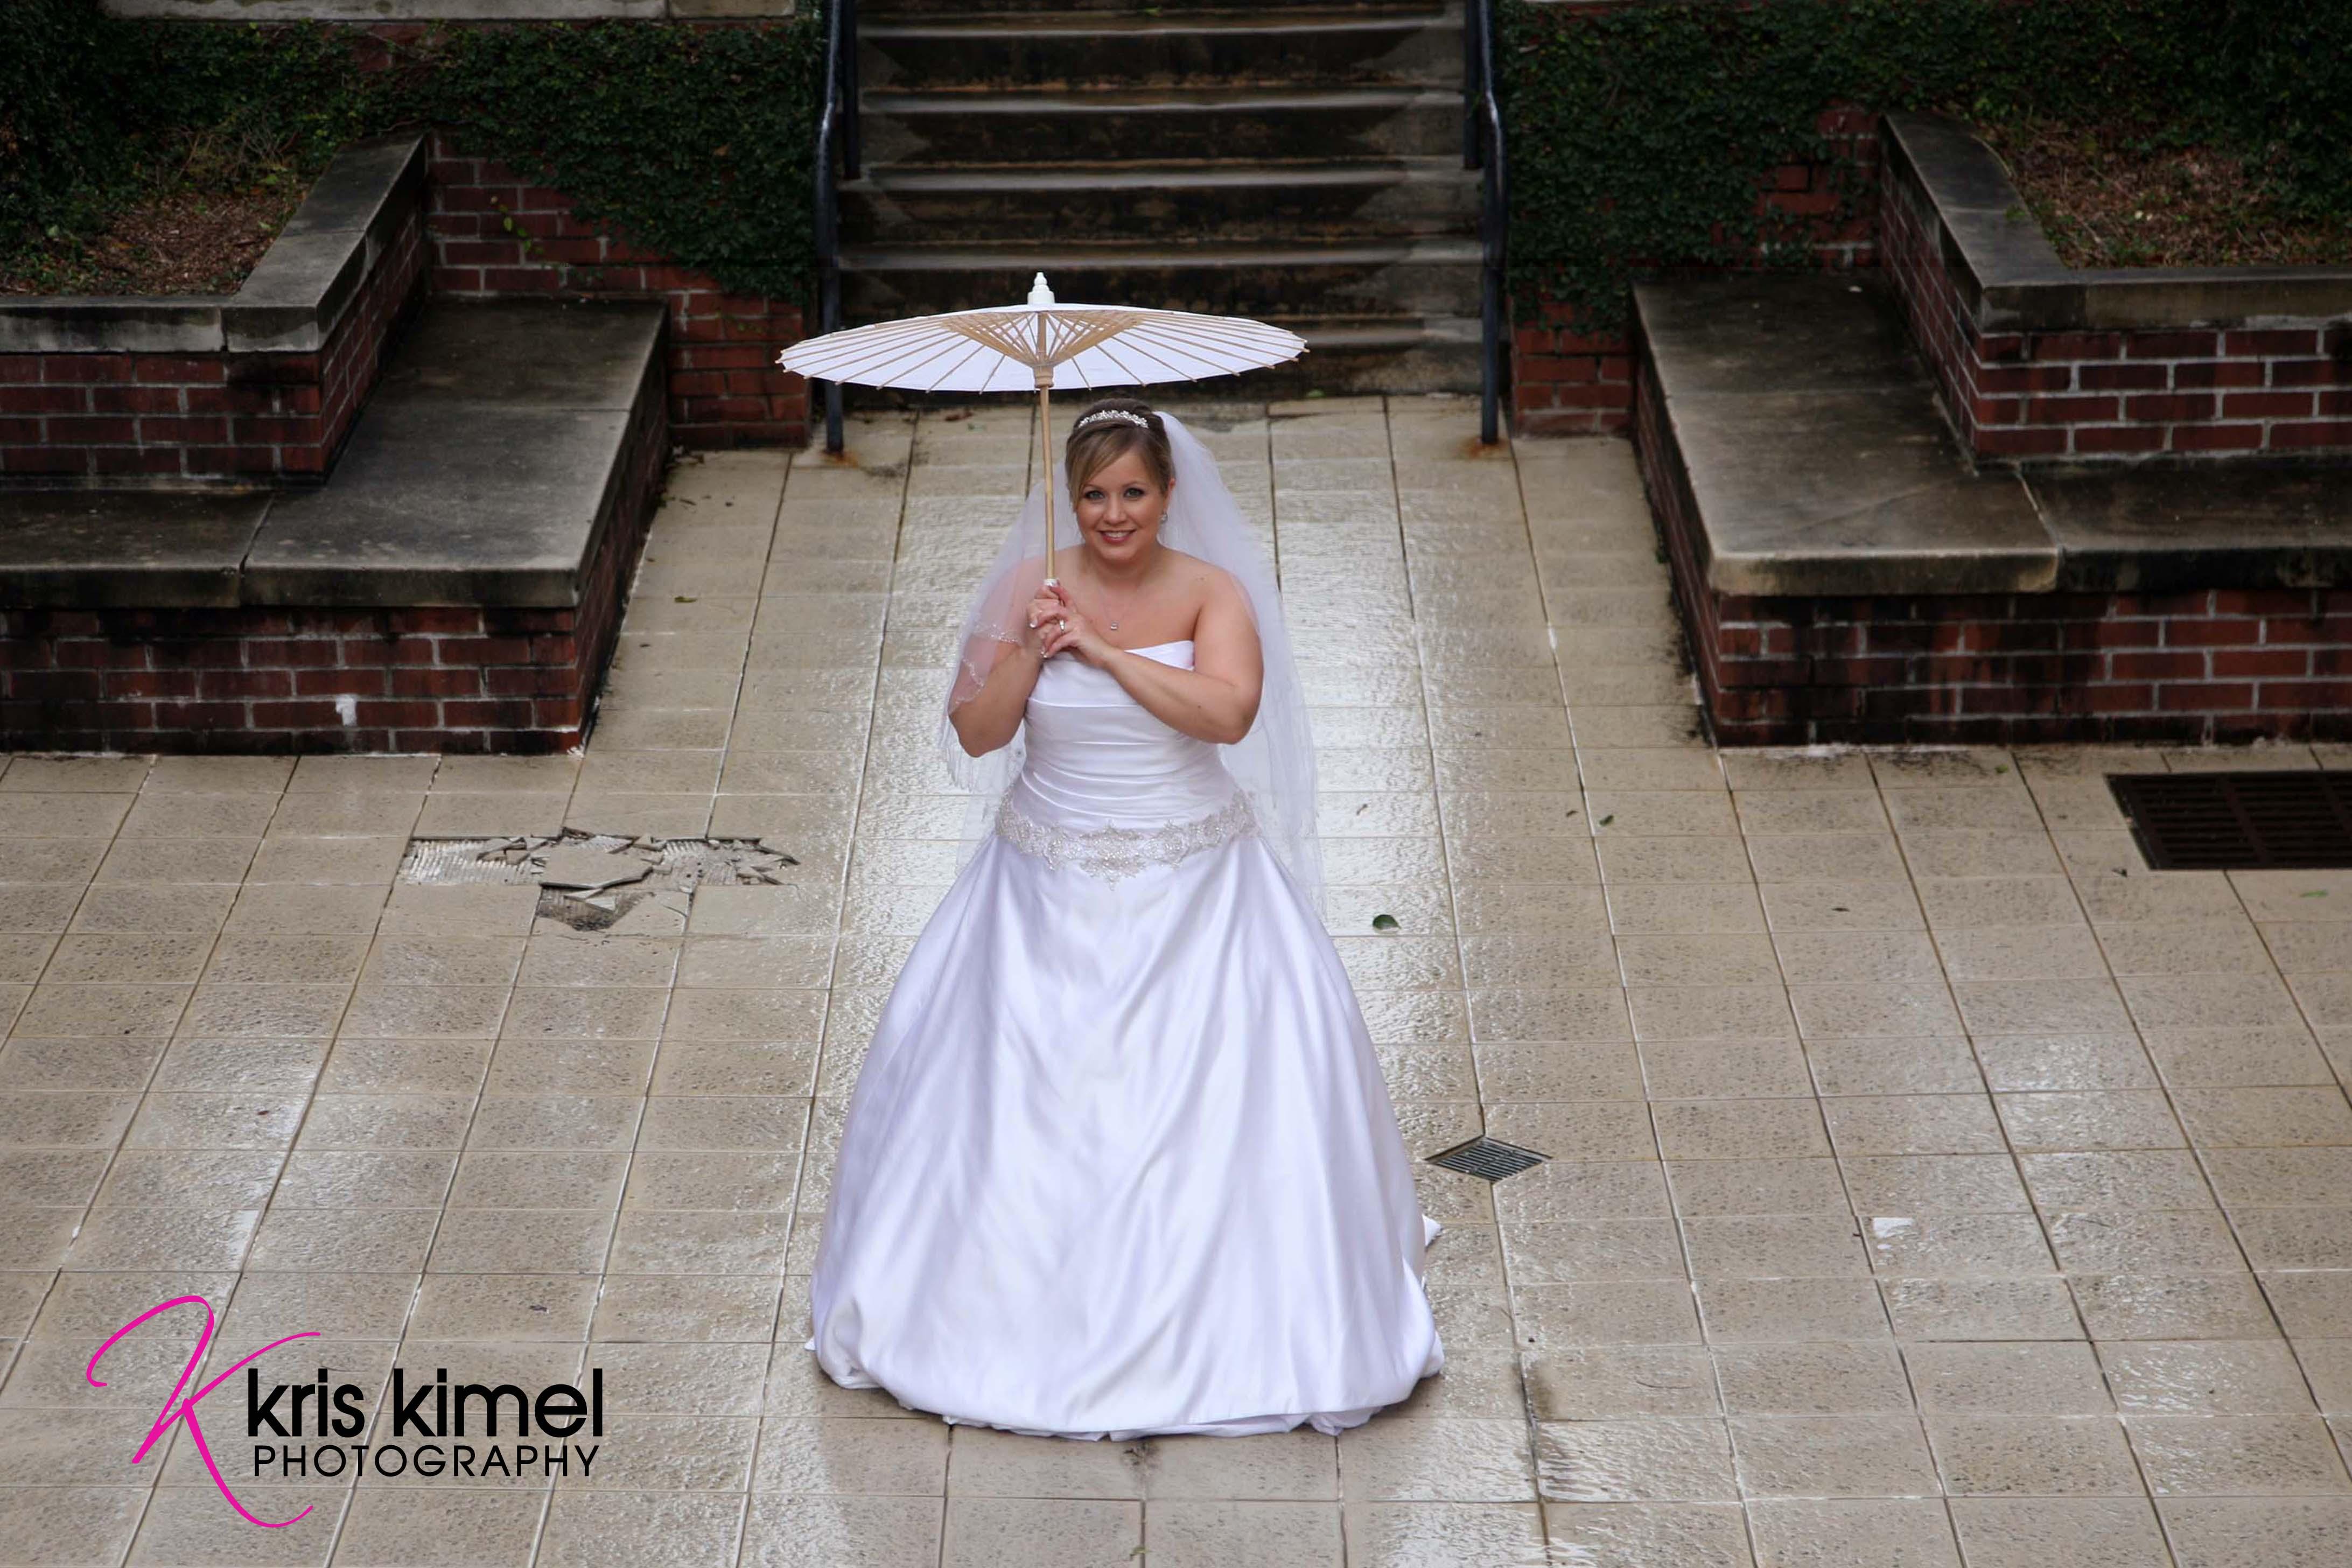 Bridal portraits kris kimel photography 39 s weblog for Wedding dresses in thomasville ga